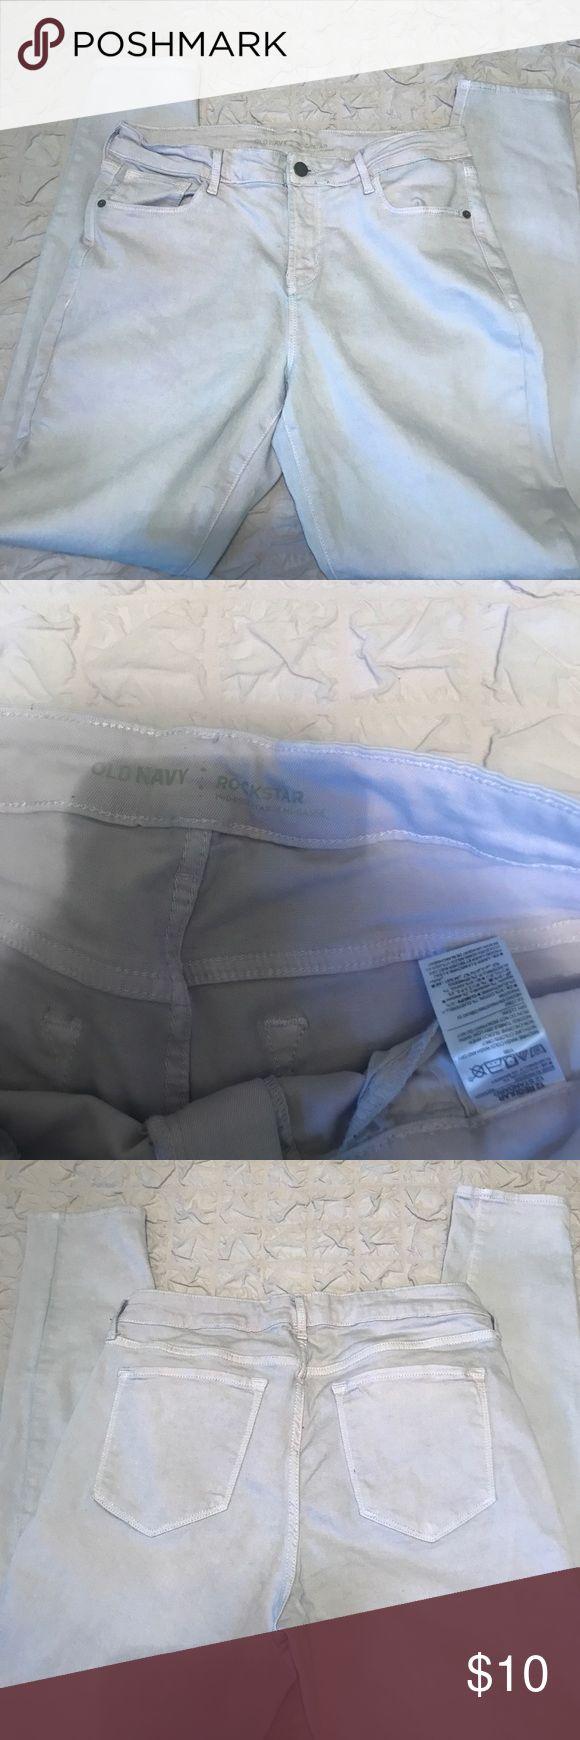 Old Navy Light Purple Skinny Jeans Light purple Old Navy rockstar mid-rise skinny jeans in good worn condition. Old Navy Jeans Skinny